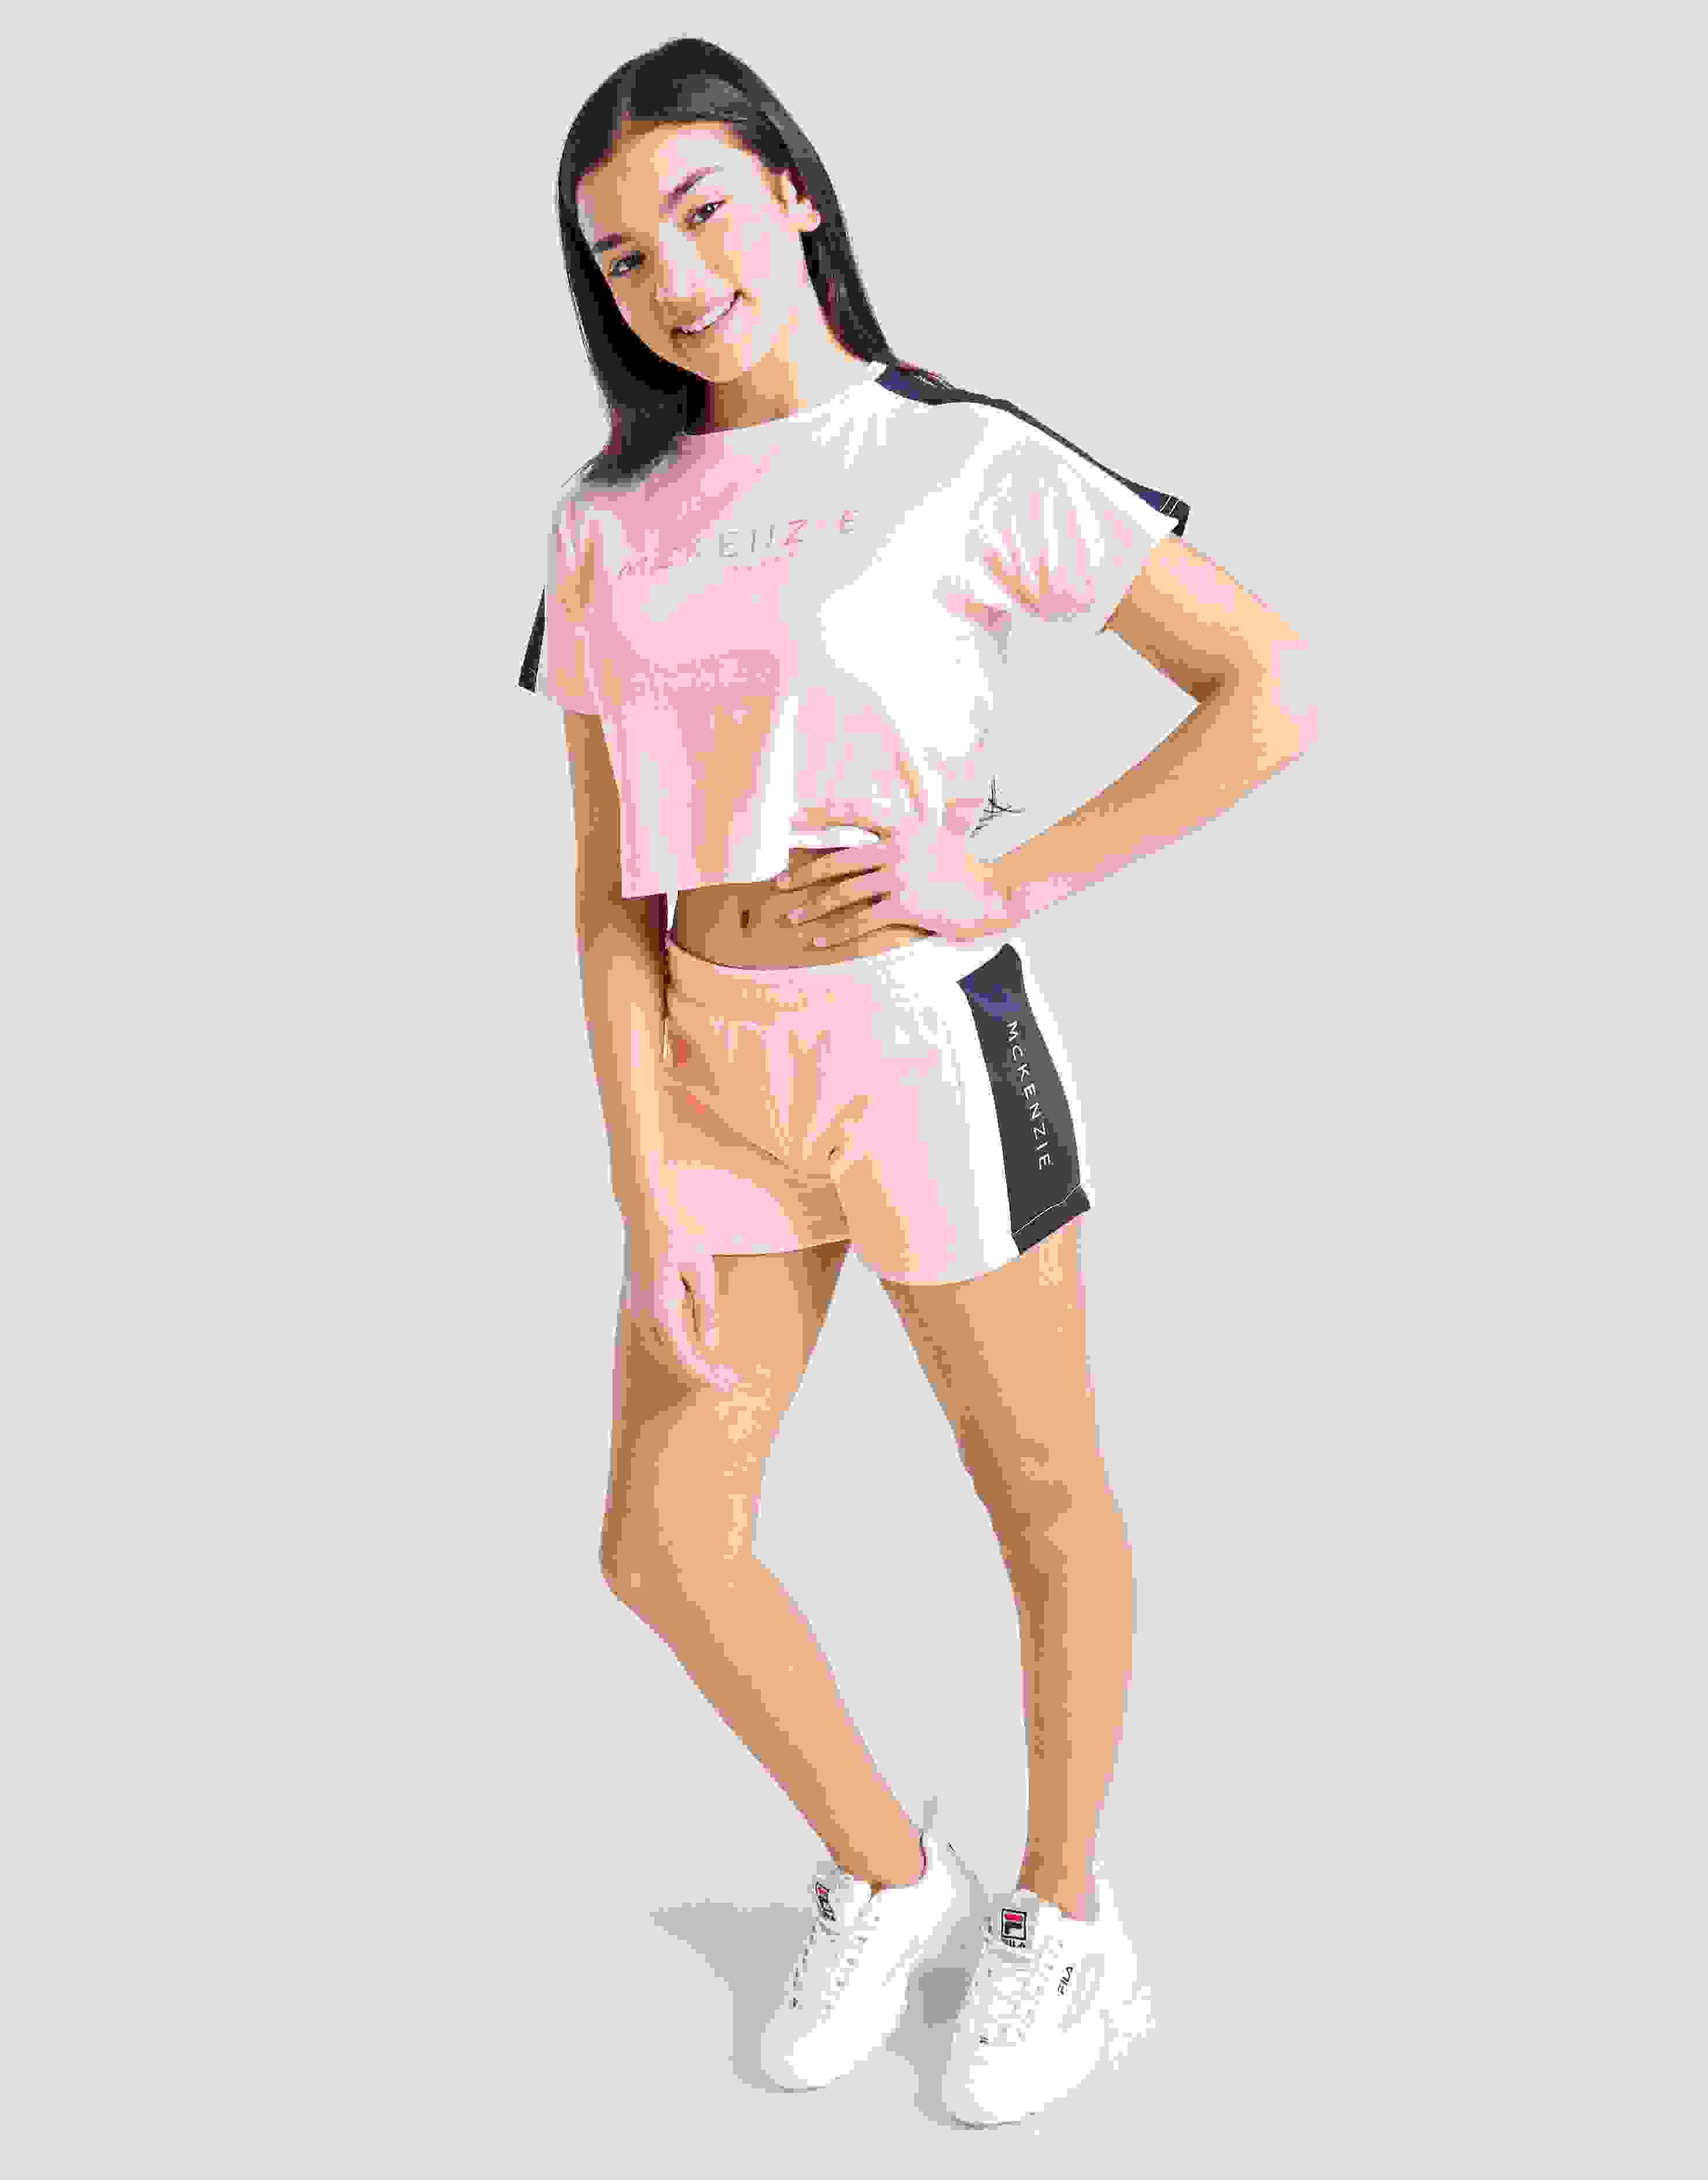 New McKenzie Girls' Rio Crop T-Shirt from JD Outlet